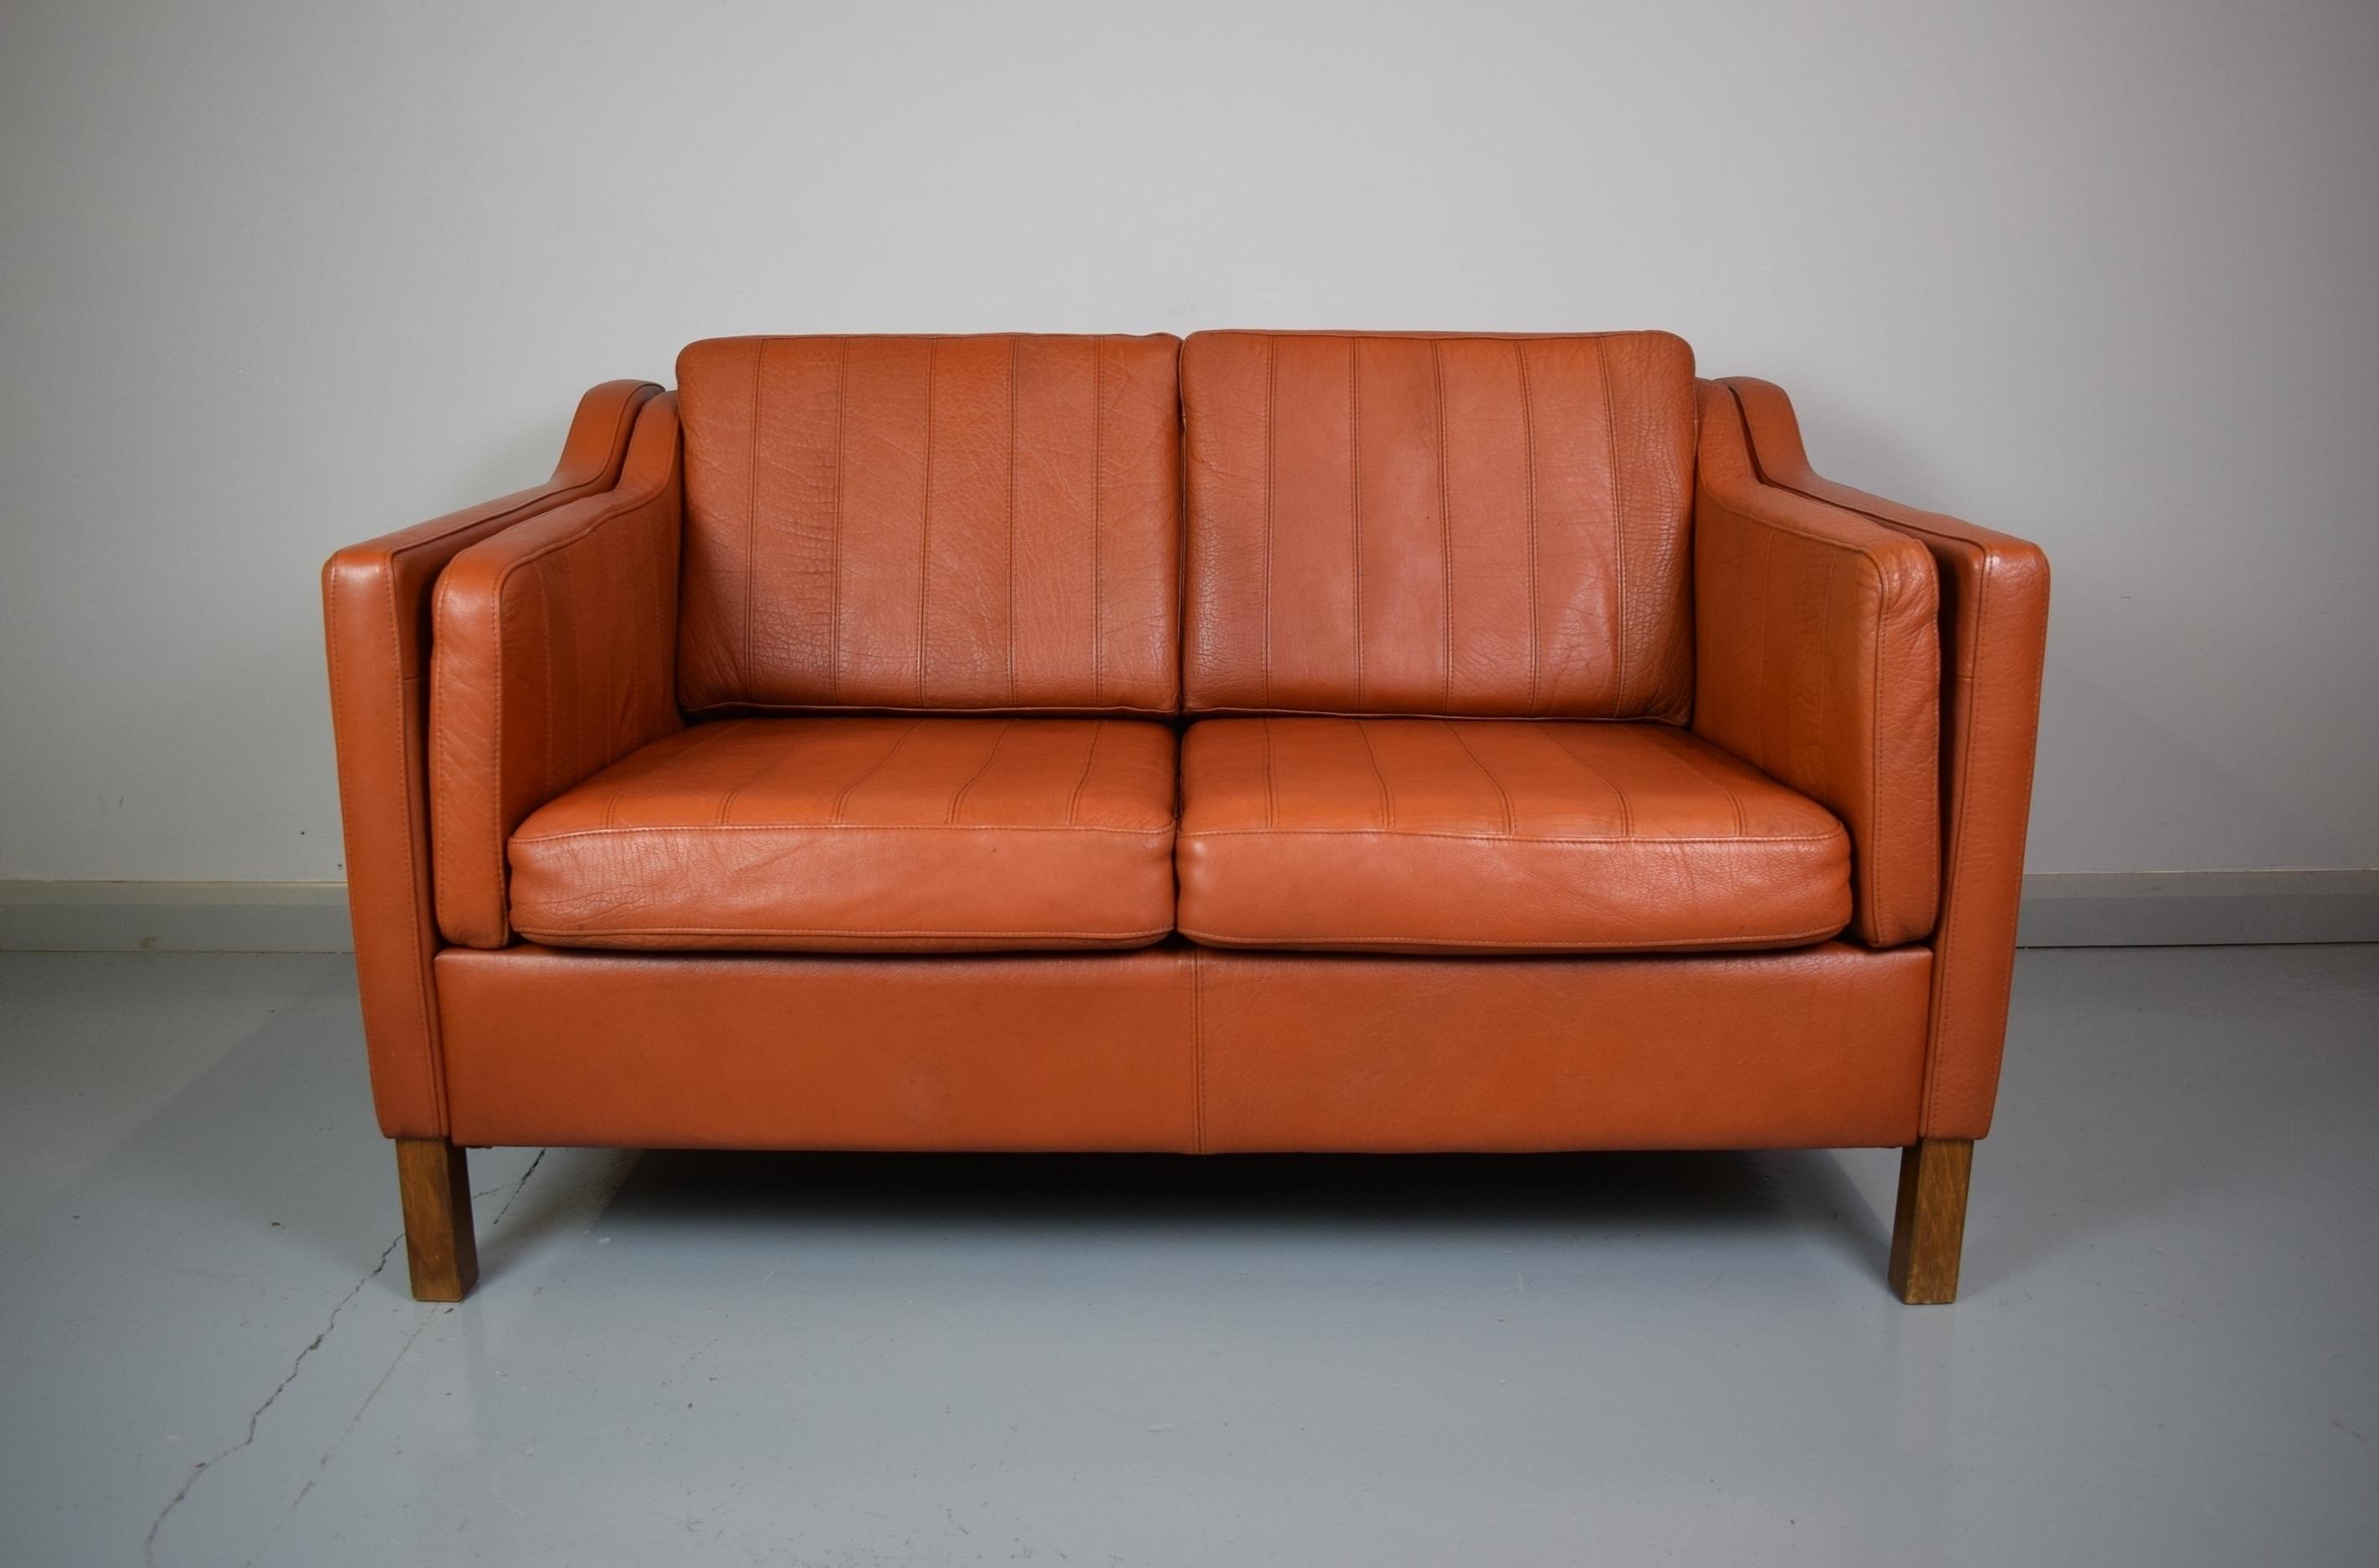 Enjoyable Mid Century Retro Danish Tan Brown Leather Mogensen Style 2 Seat Sofa Loveseat Dailytribune Chair Design For Home Dailytribuneorg